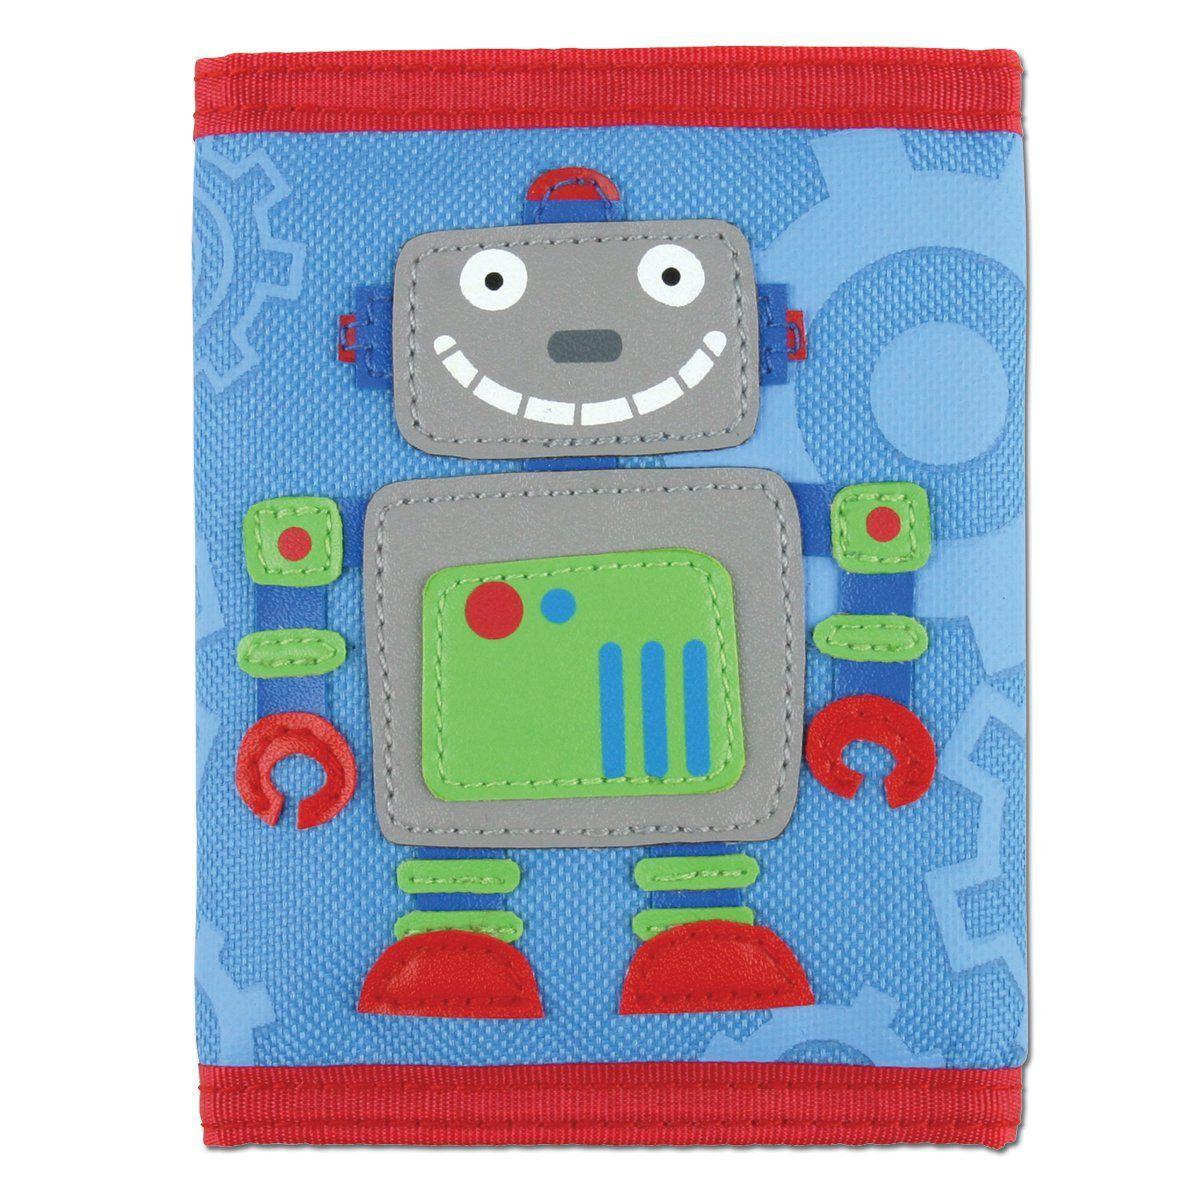 Carteira Infantil Robô - Stephen Joseph